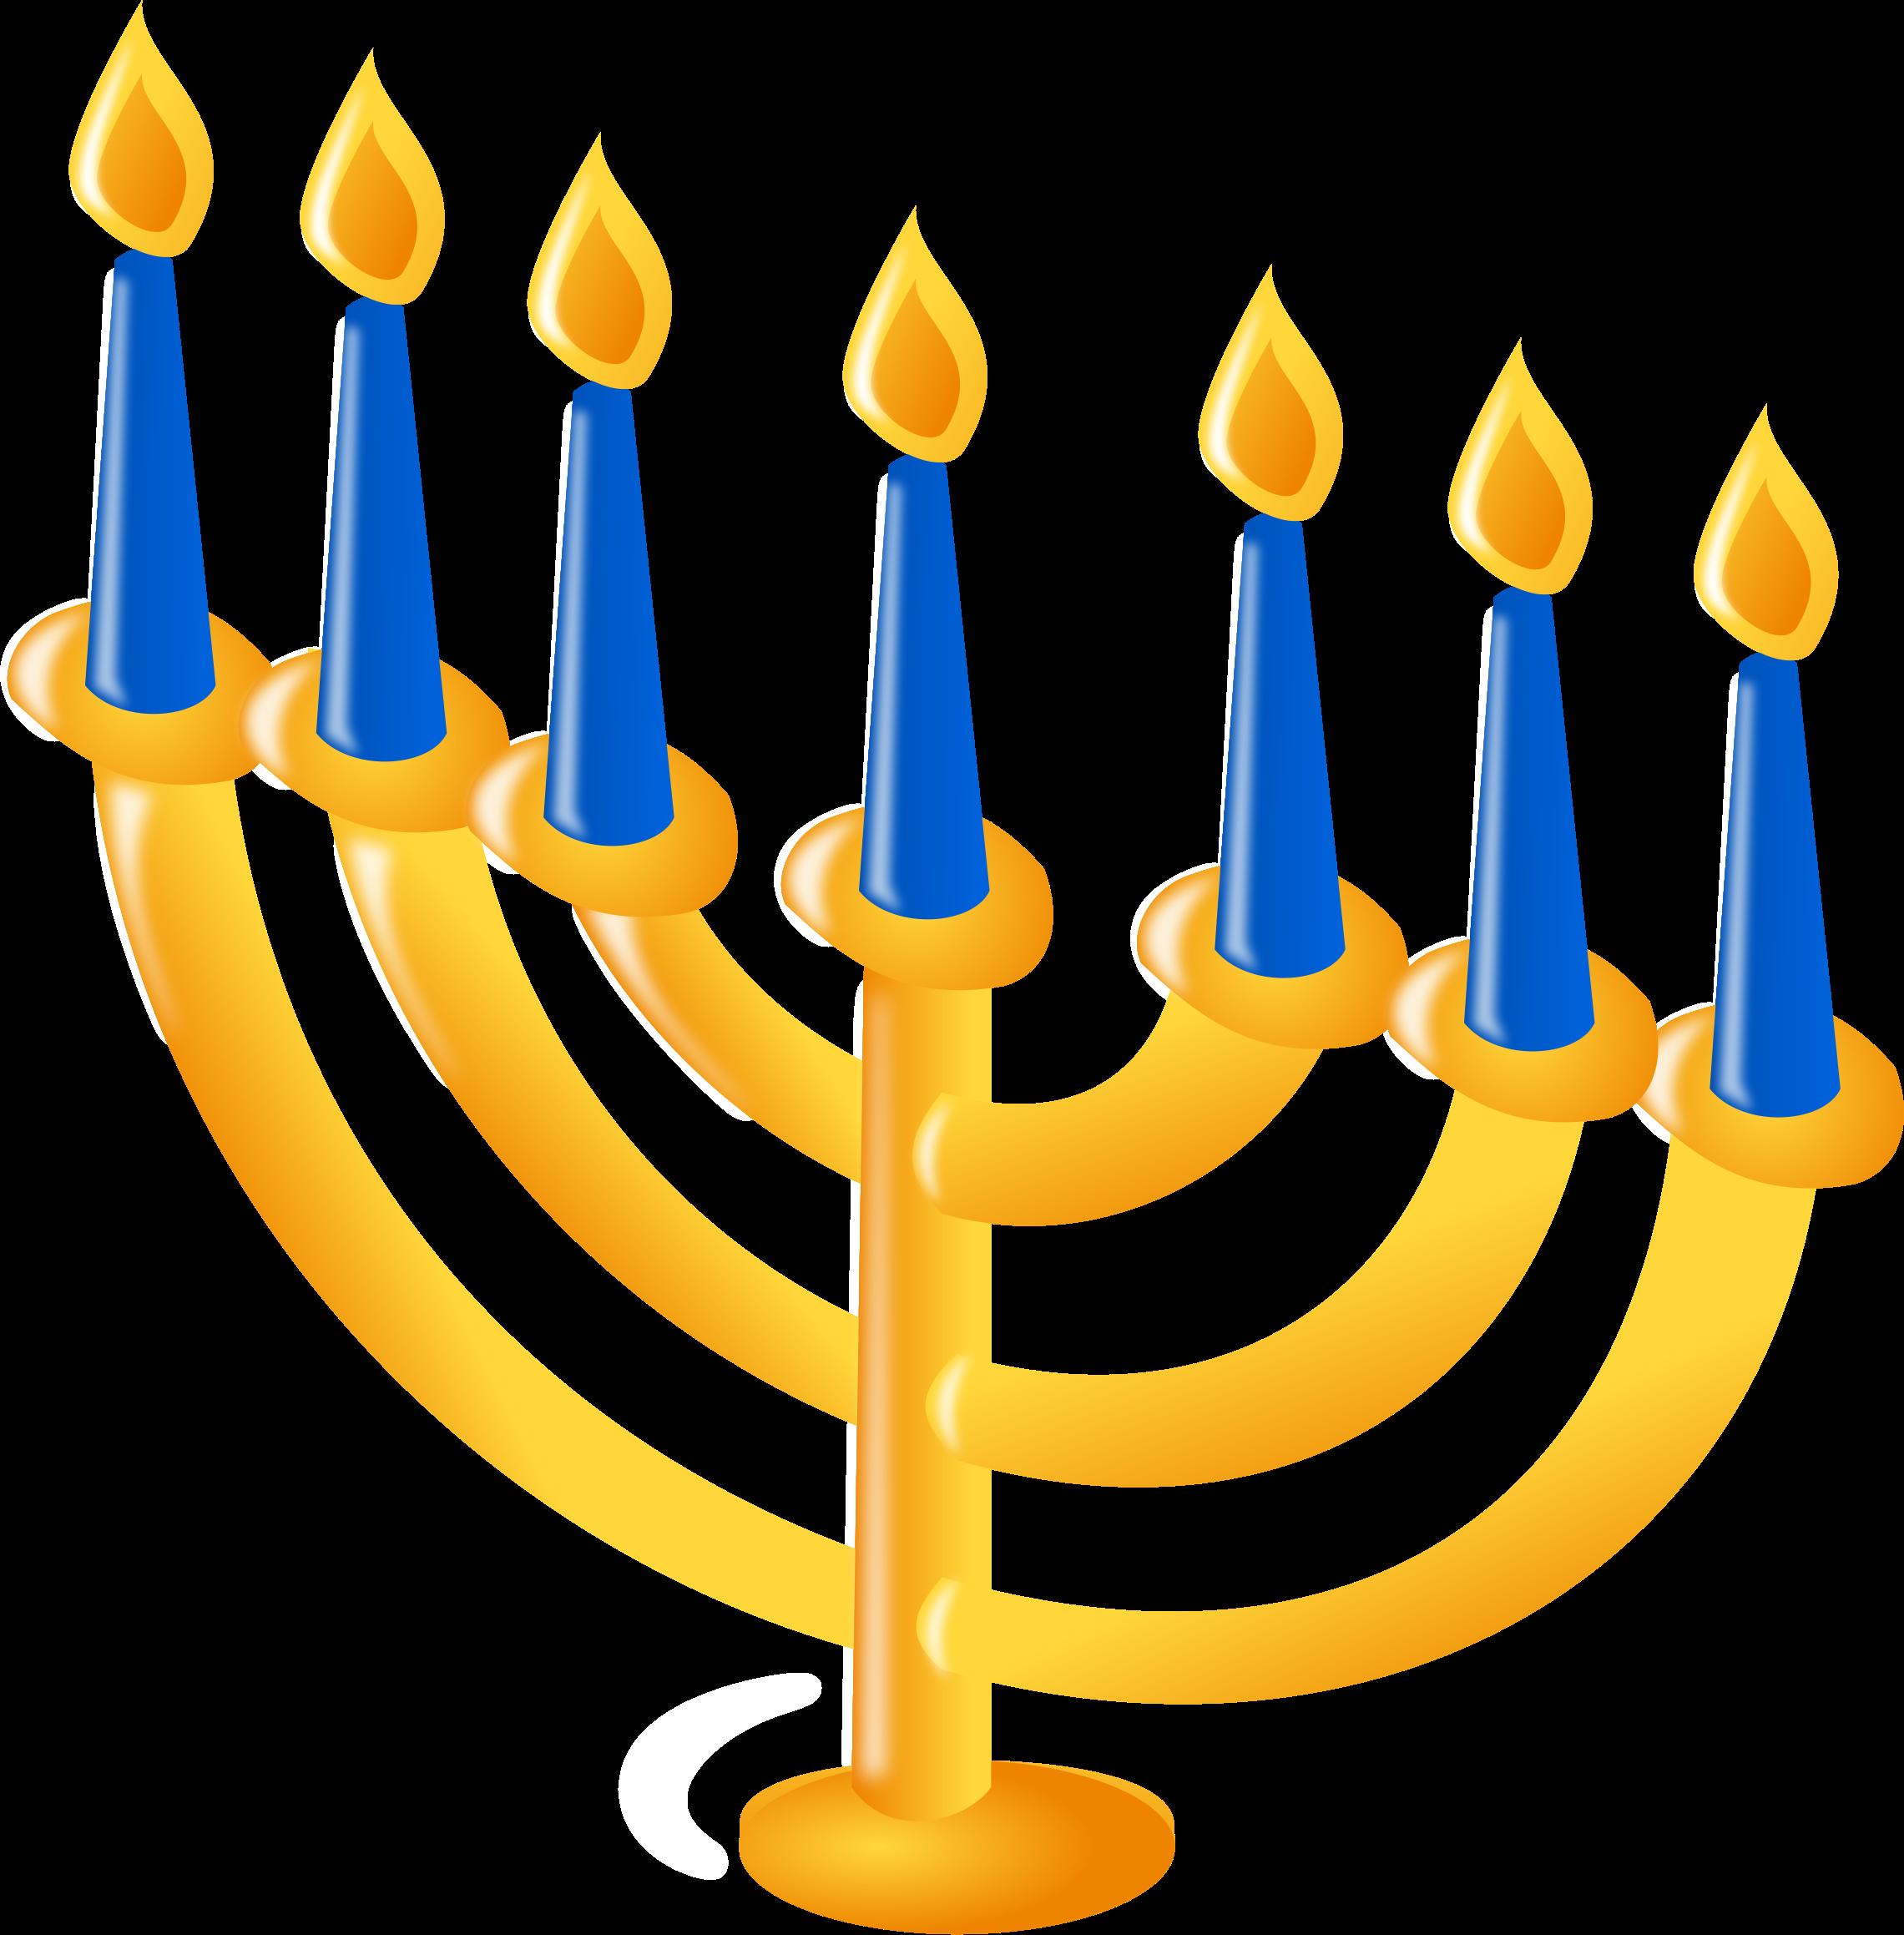 Hanukkah ns4 by rduris.